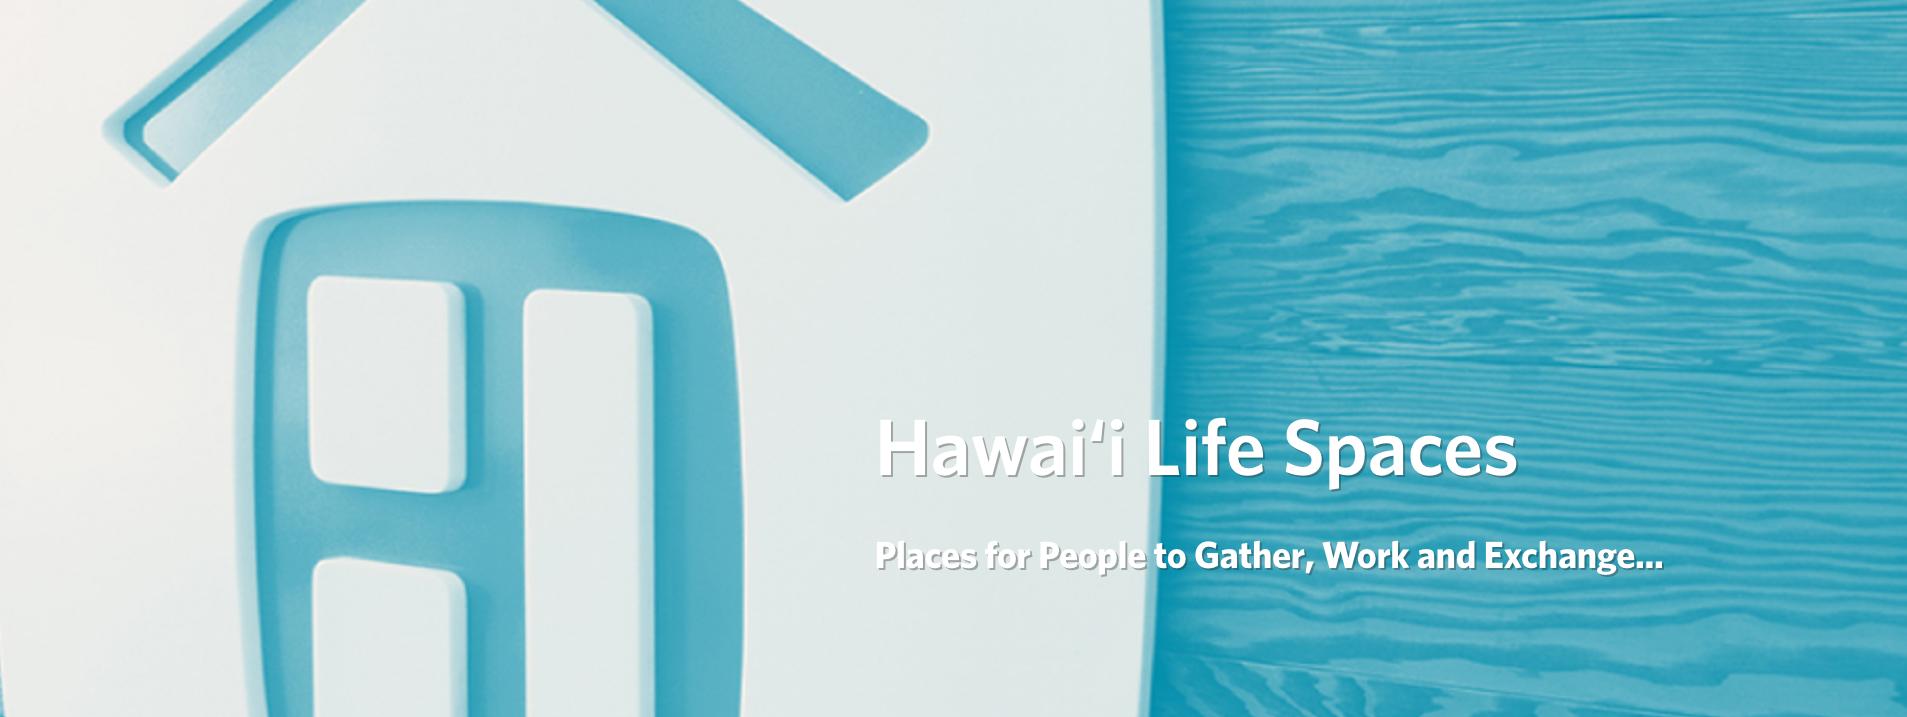 Hawaii Life Real Estate Brokers reviews   Local Services at 500 Kalanianaole Ave - Hilo HI